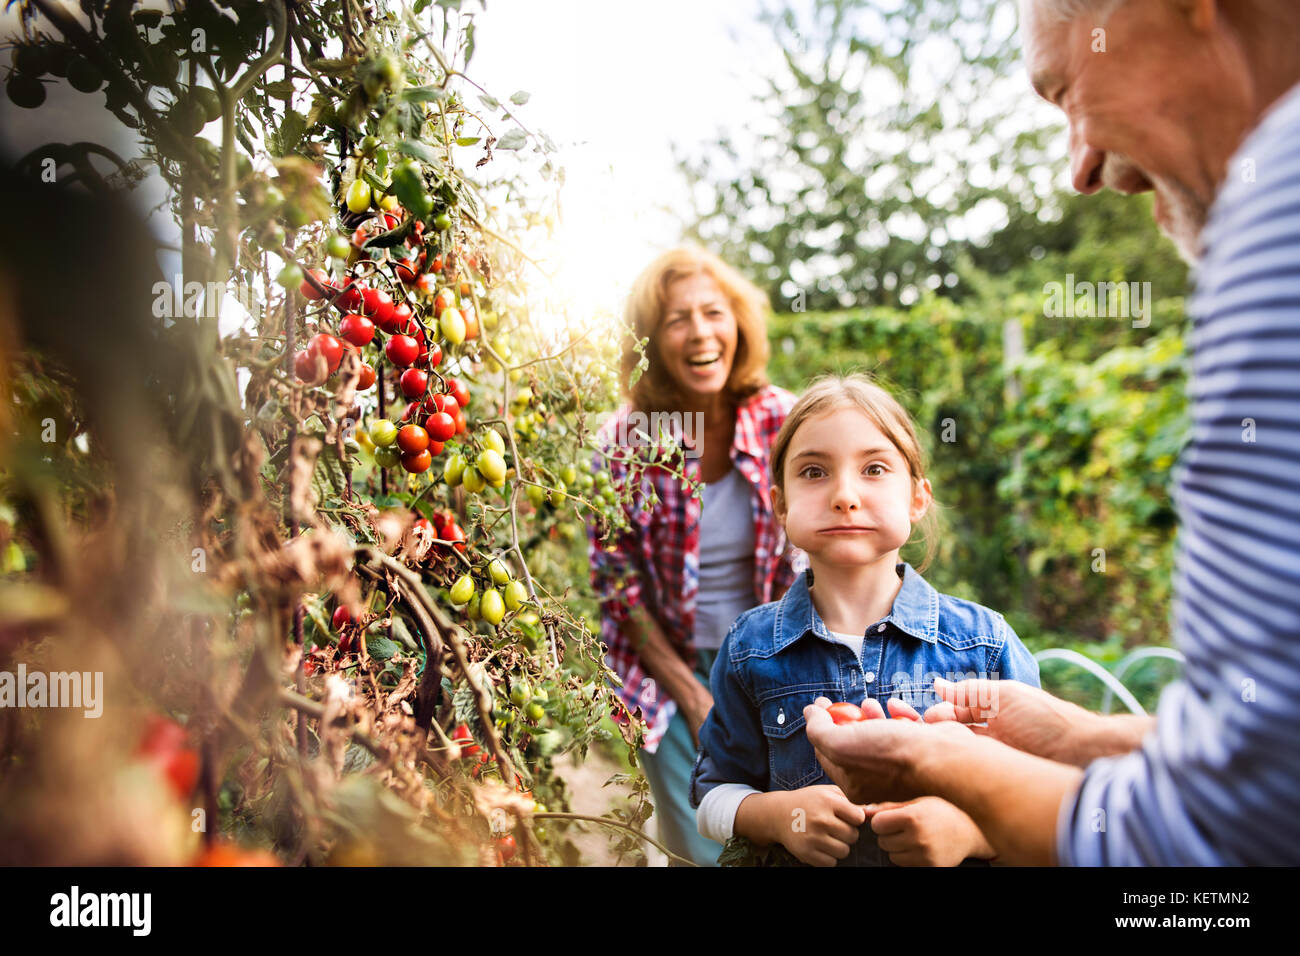 Senior couple with grandaughter gardening in the backyard garden - Stock Image